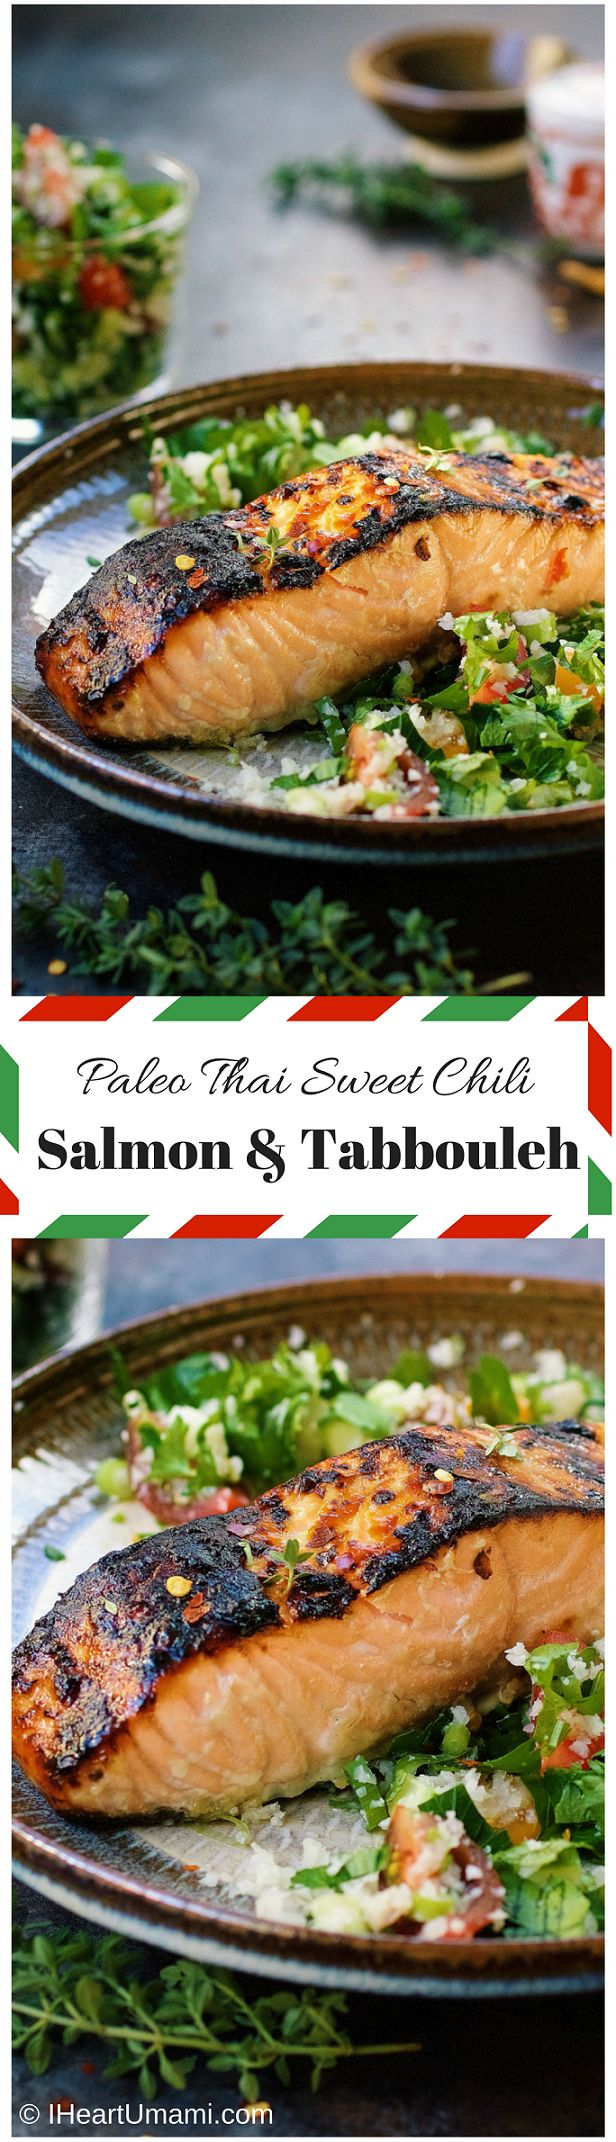 Paleo Thai Sweet Chili Salmon Tabbouleh (Tabouli) | IHeartUmami.com